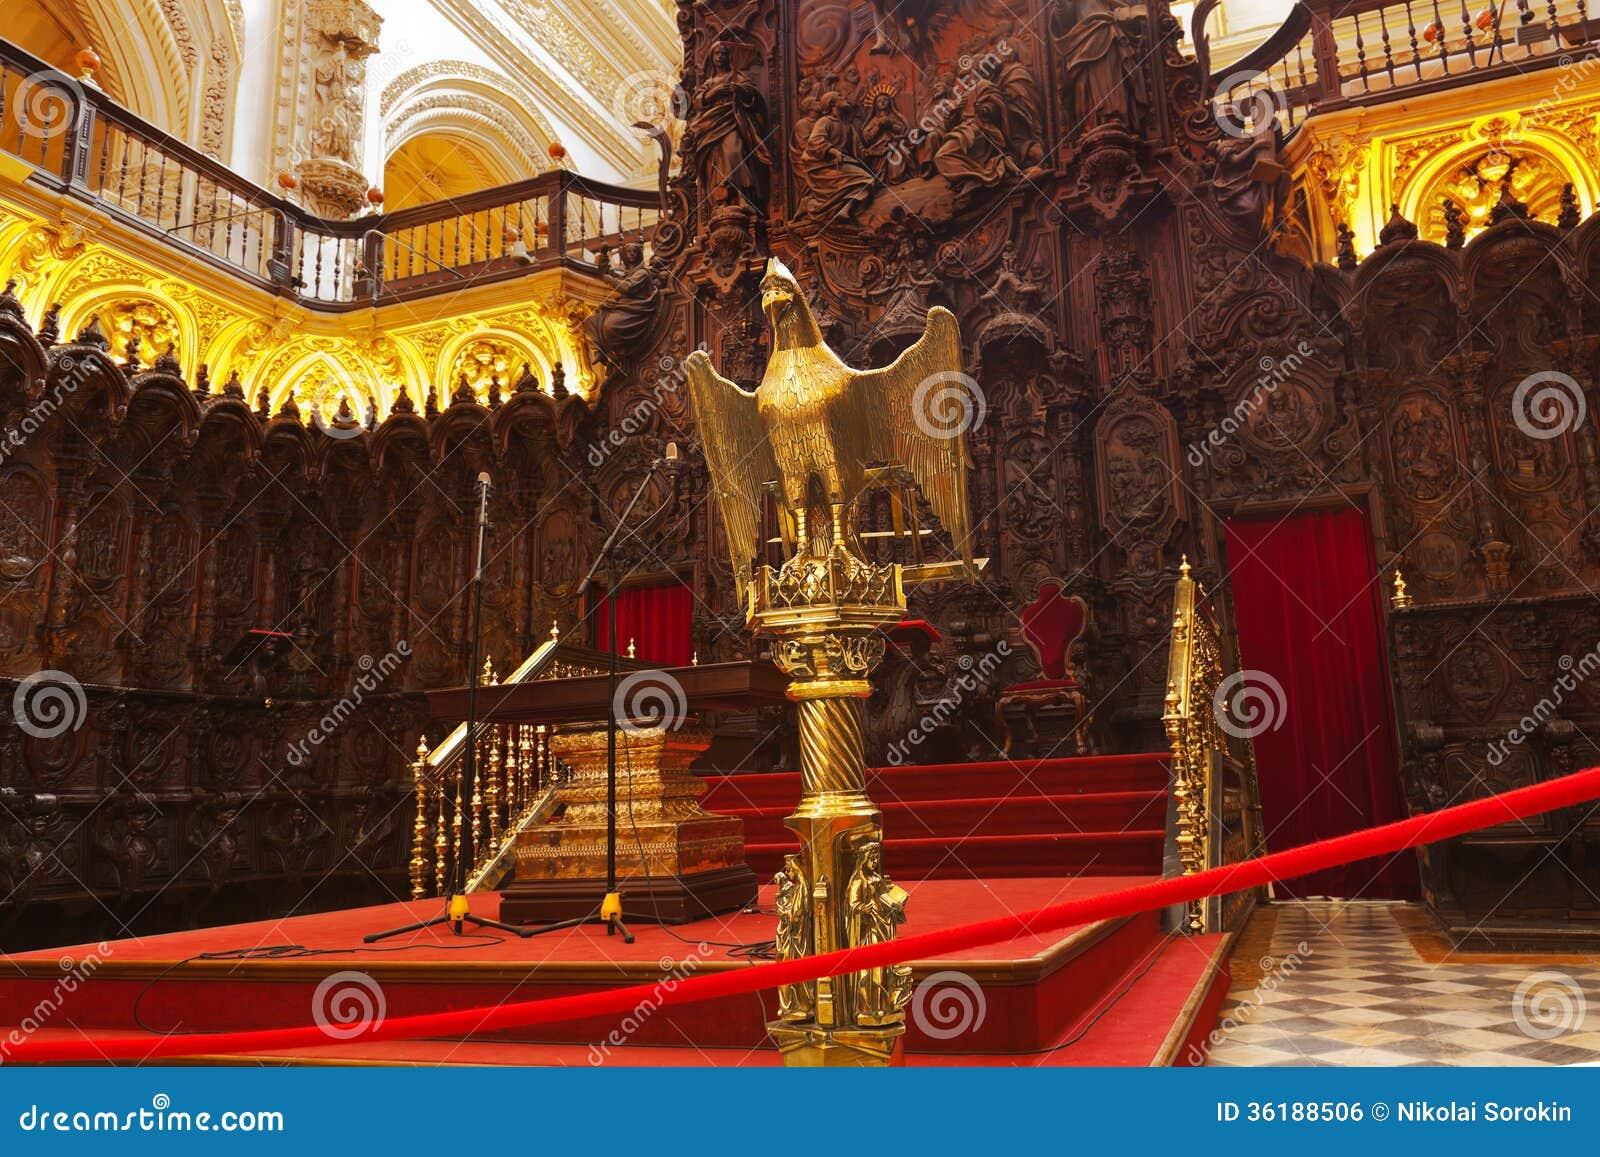 Great Mosque Mezquita Interior In Cordoba Spain Stock